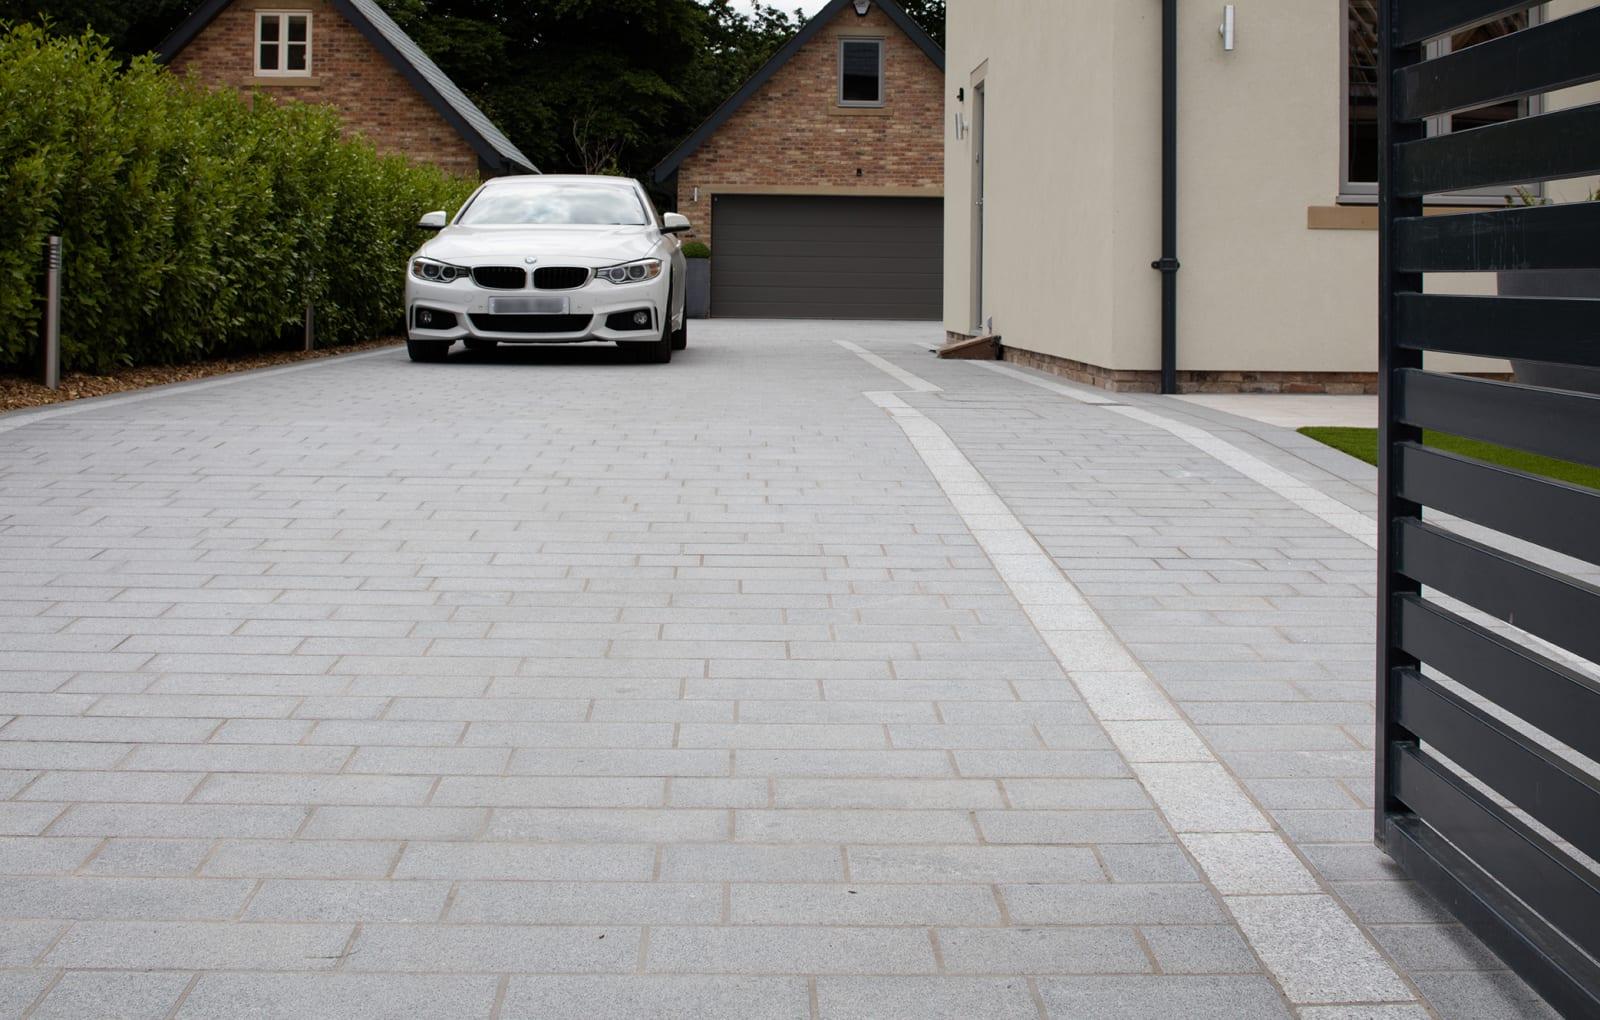 Sawn Granite Setts in Dark and Light driveway